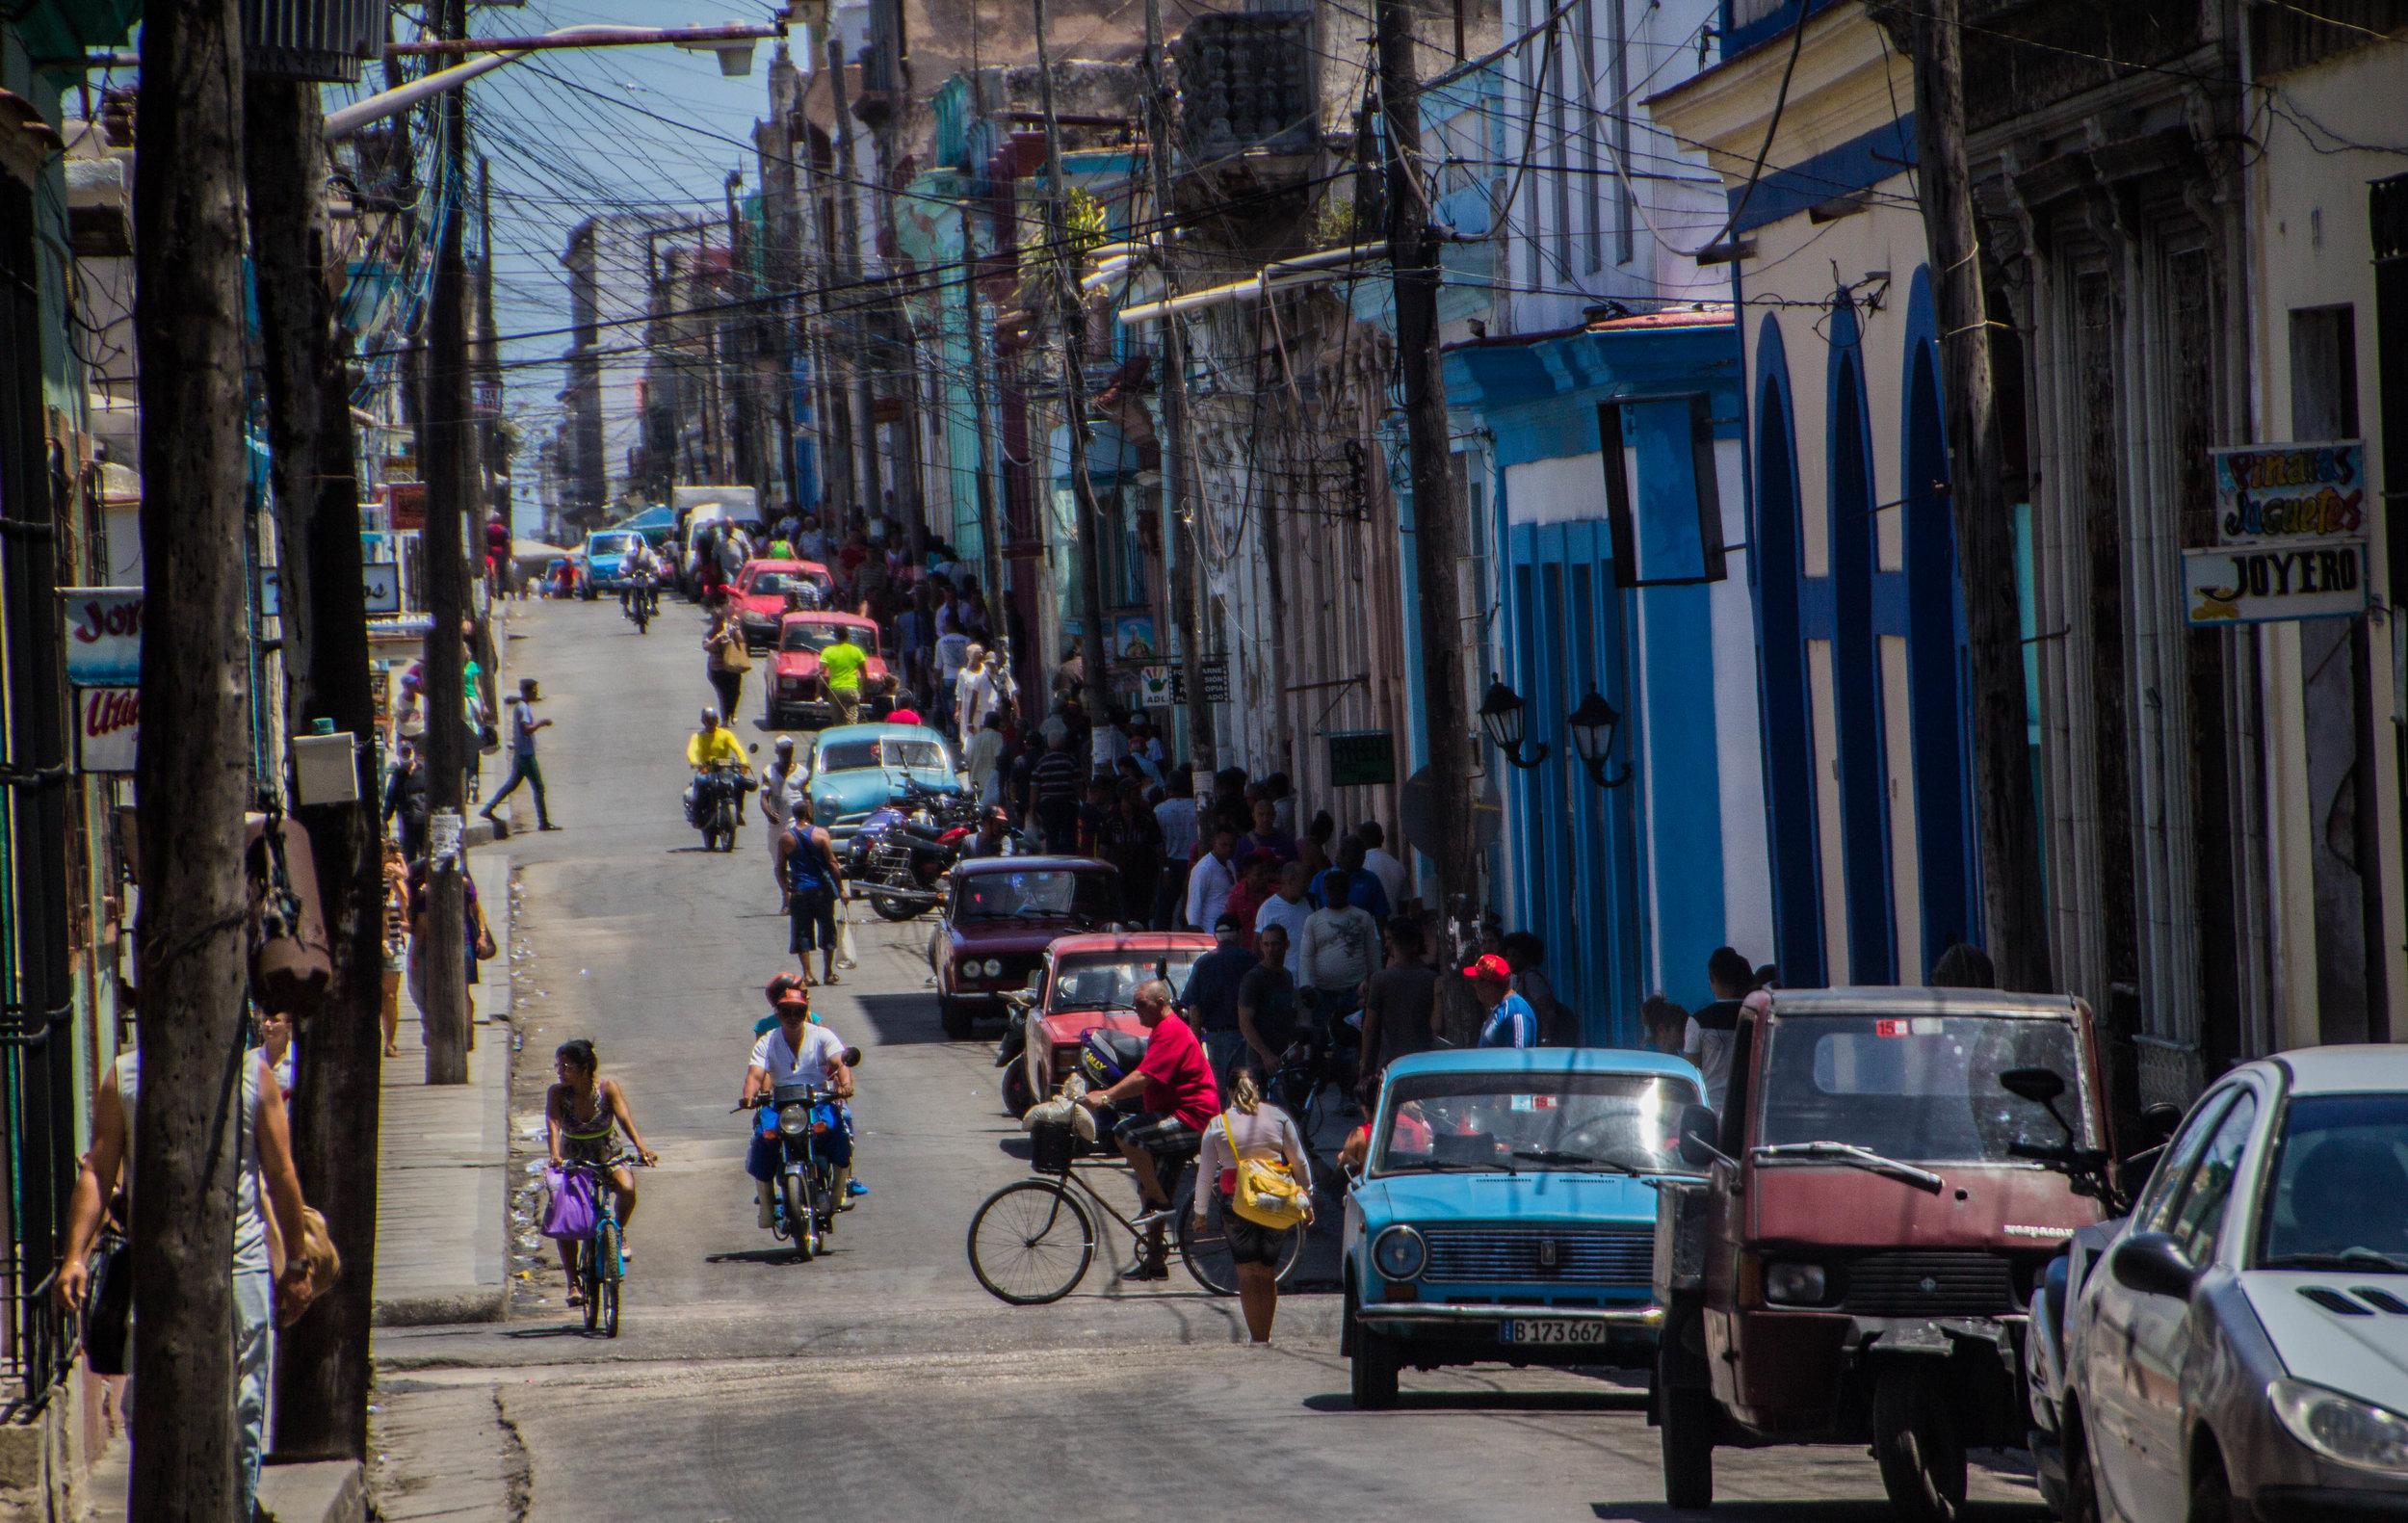 matanzas cuba streets cars-1-2-2.jpg